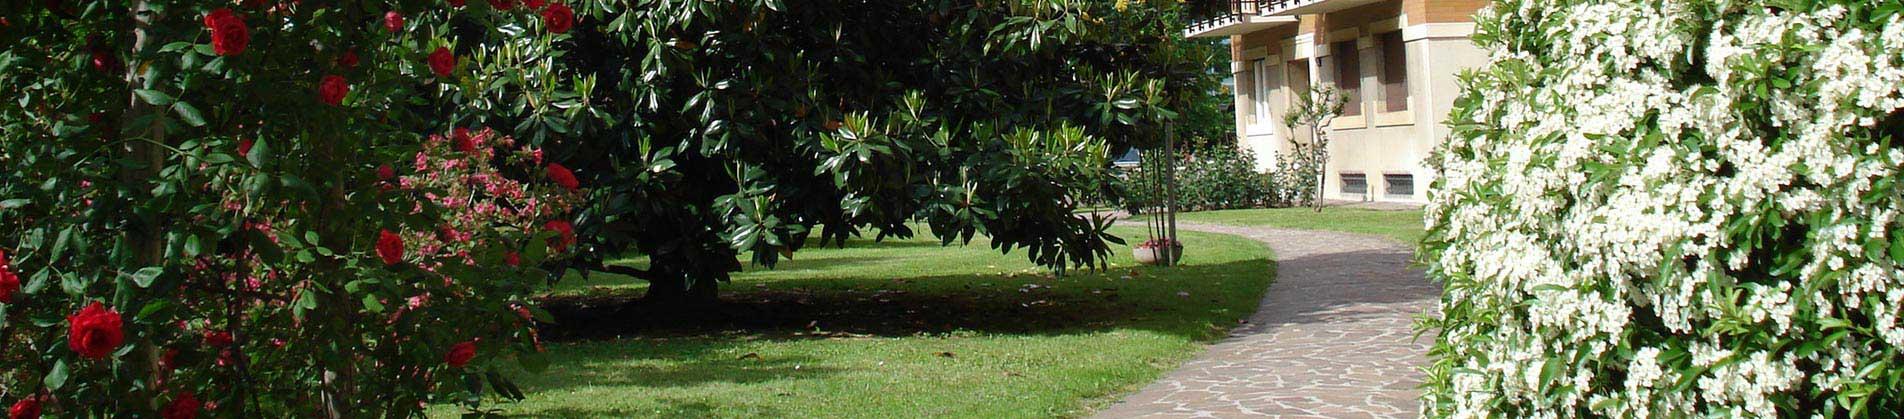 Cura di giardini condominiali